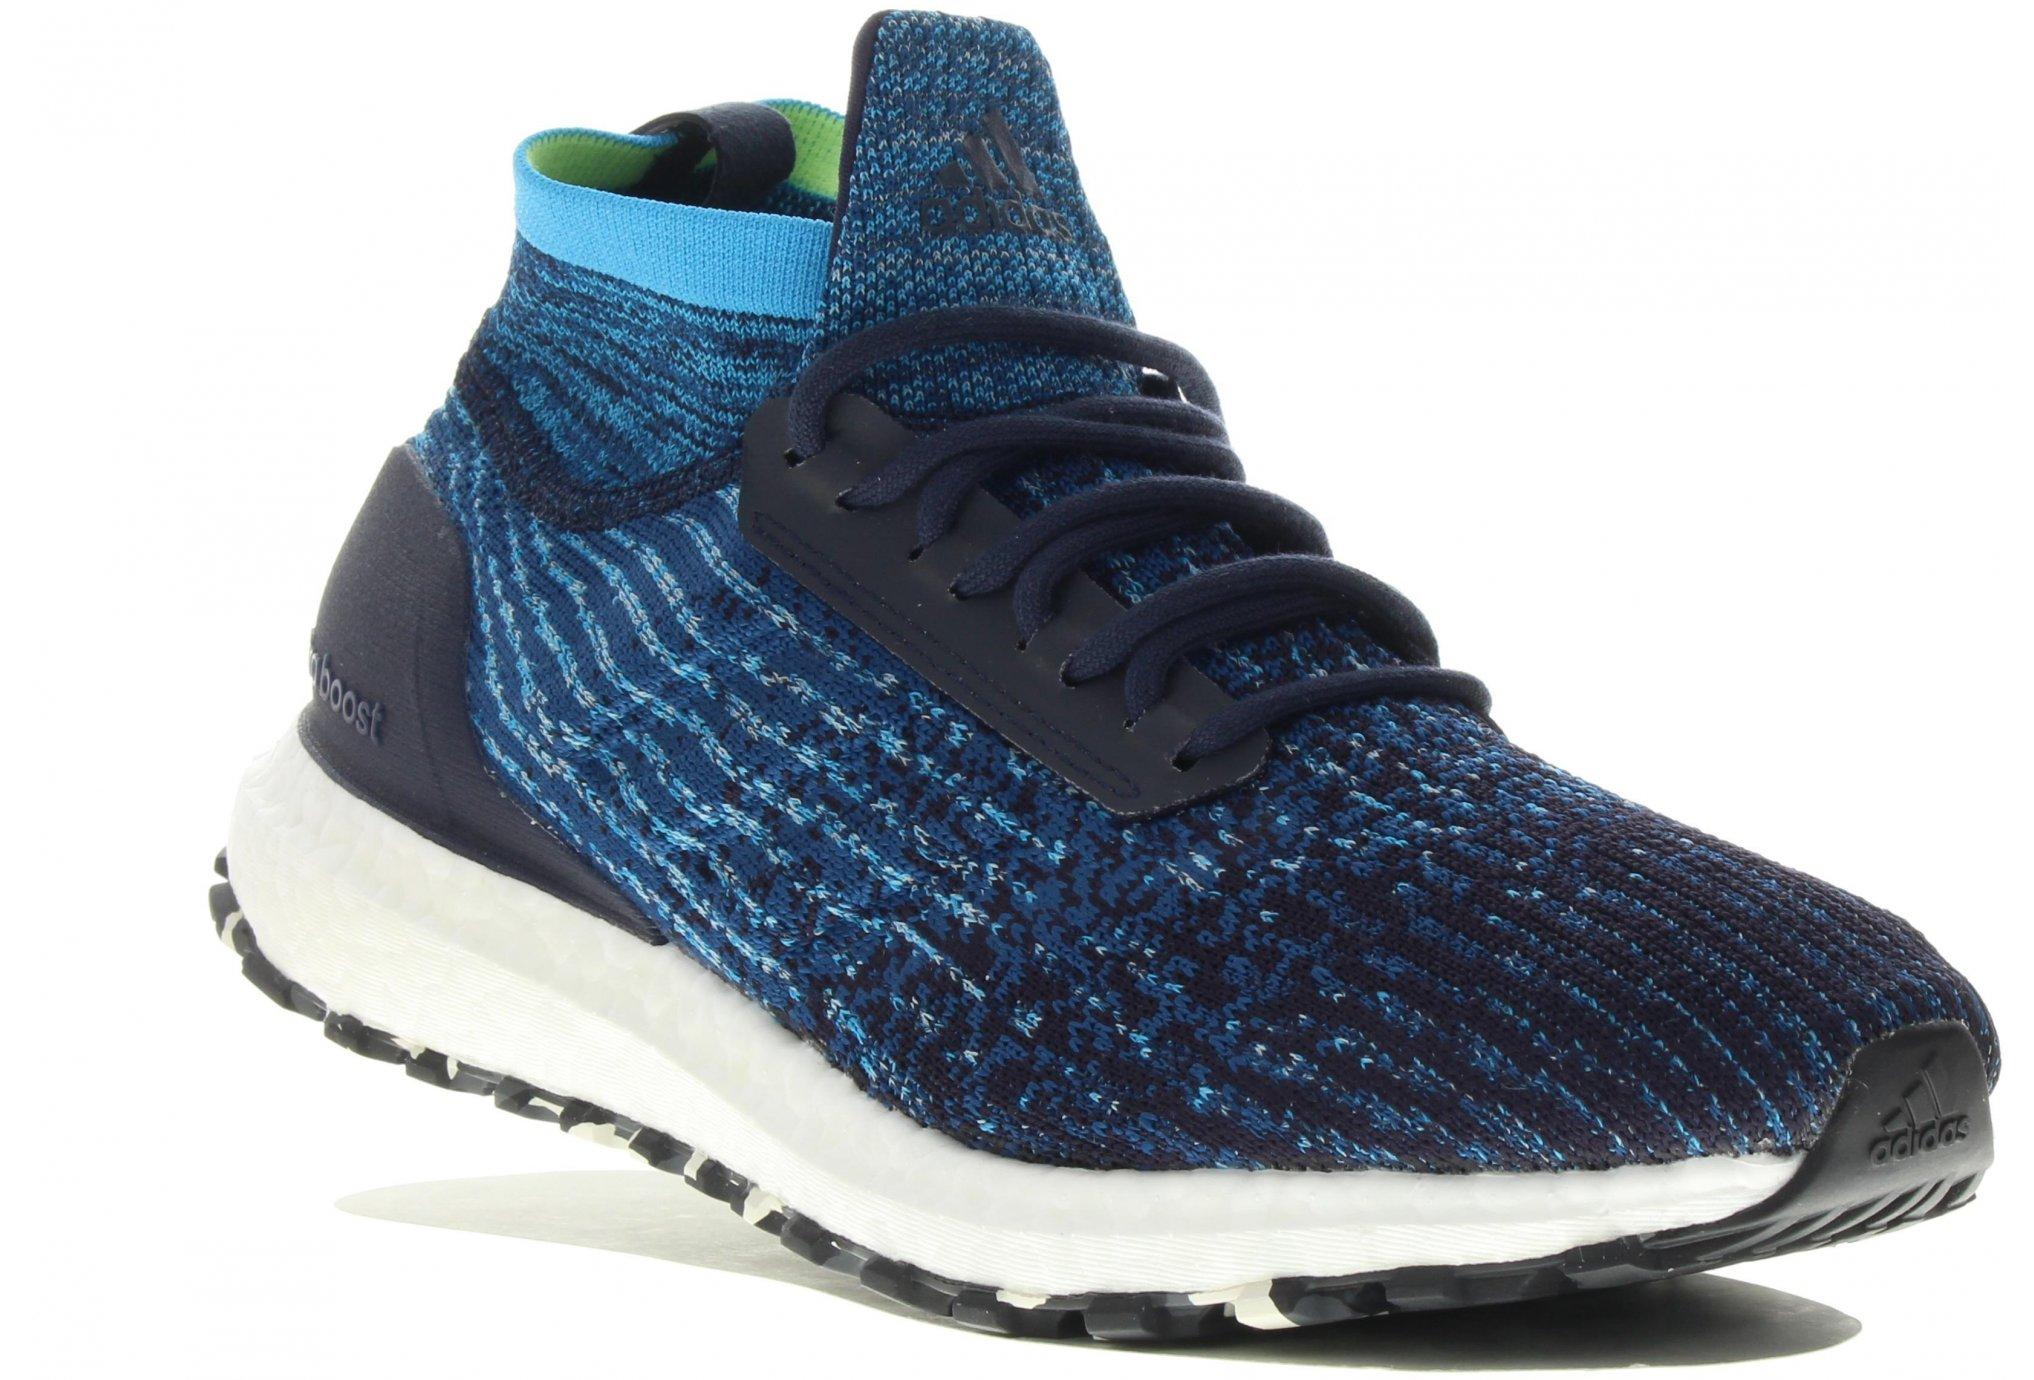 Terrain All Ultraboost Adidas Adidas Bleu sQCrhtd